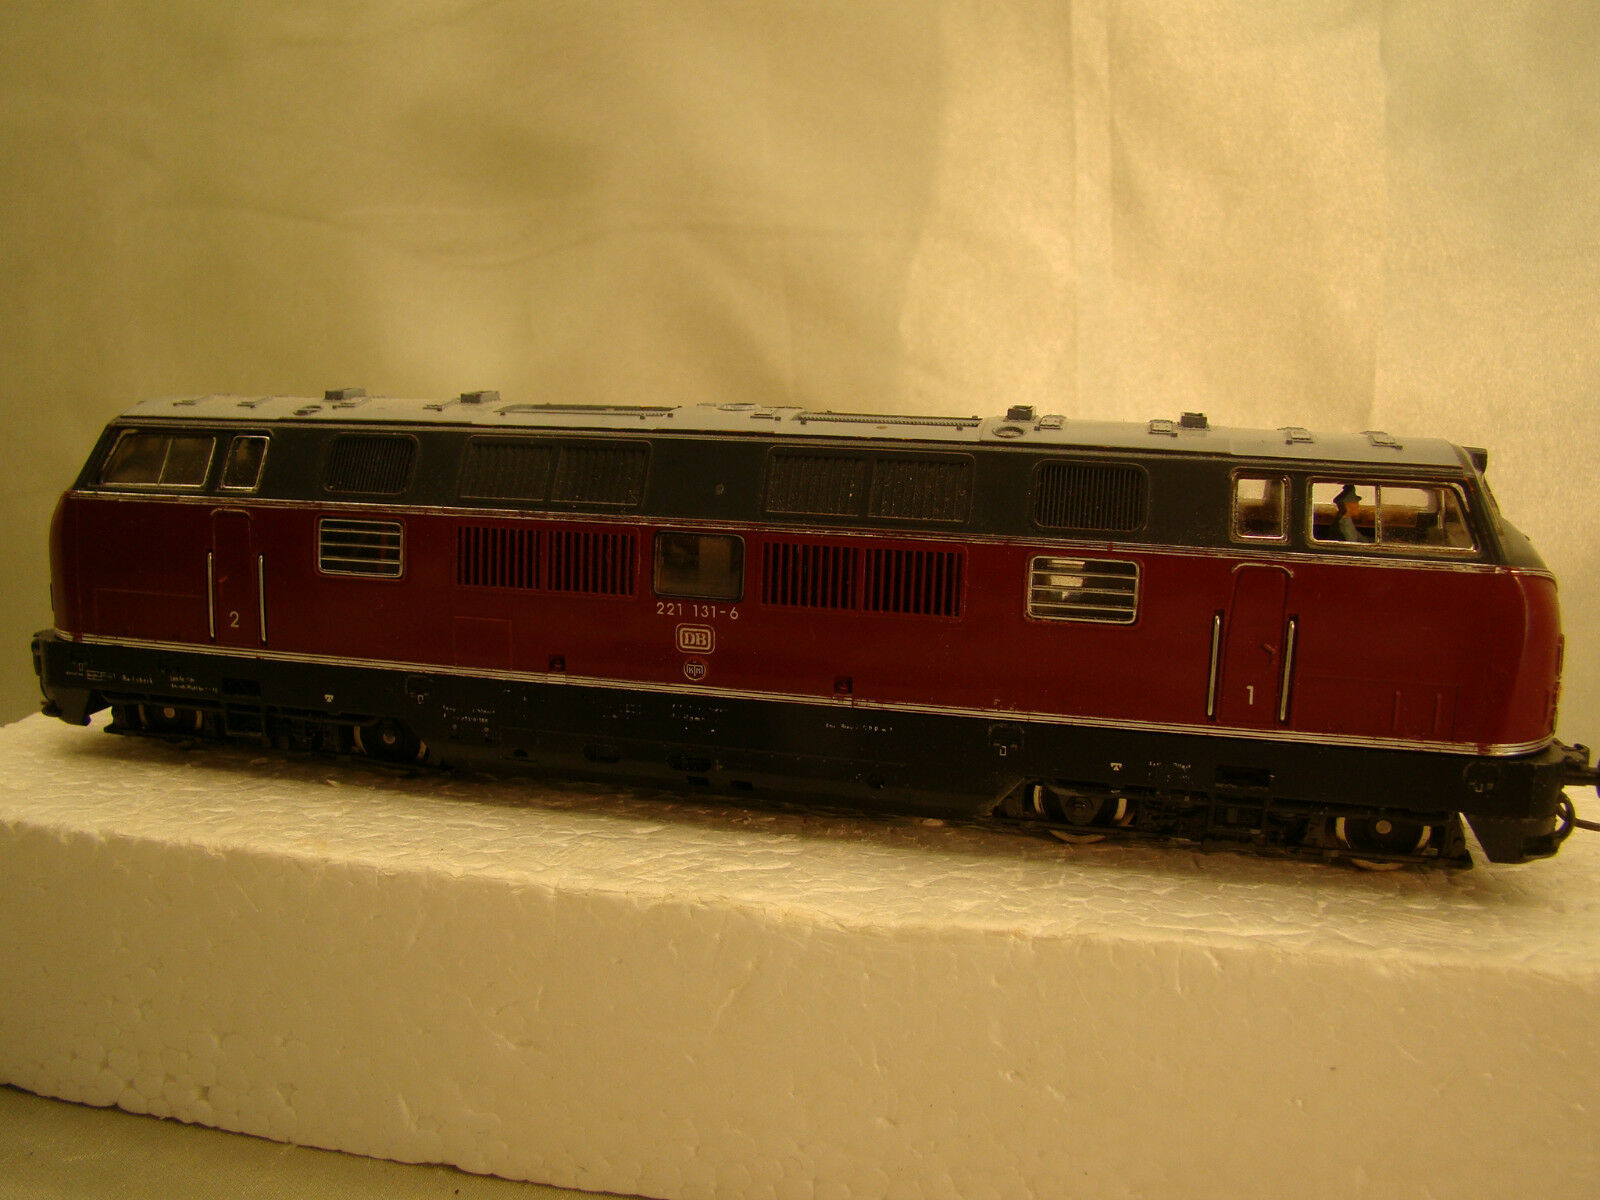 Fleischmann TEE Diesel Engine - beautiful model - completely serviced - HO scale